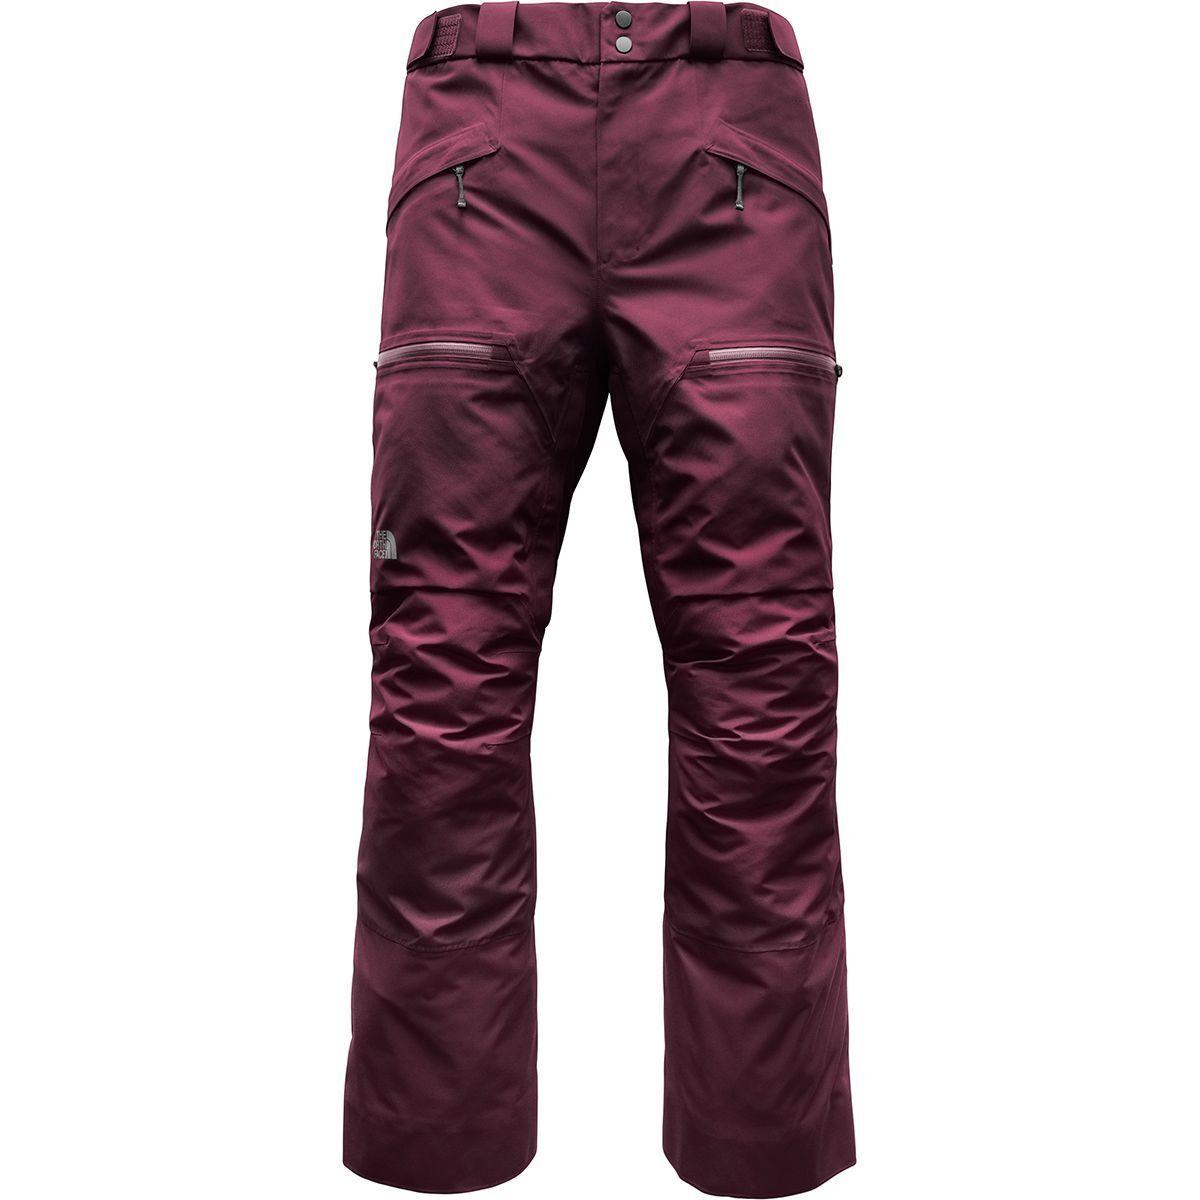 The North Face Men's POWDERFLO Gore-Tex Shell Ski Pants Salopettes Fig Purple M